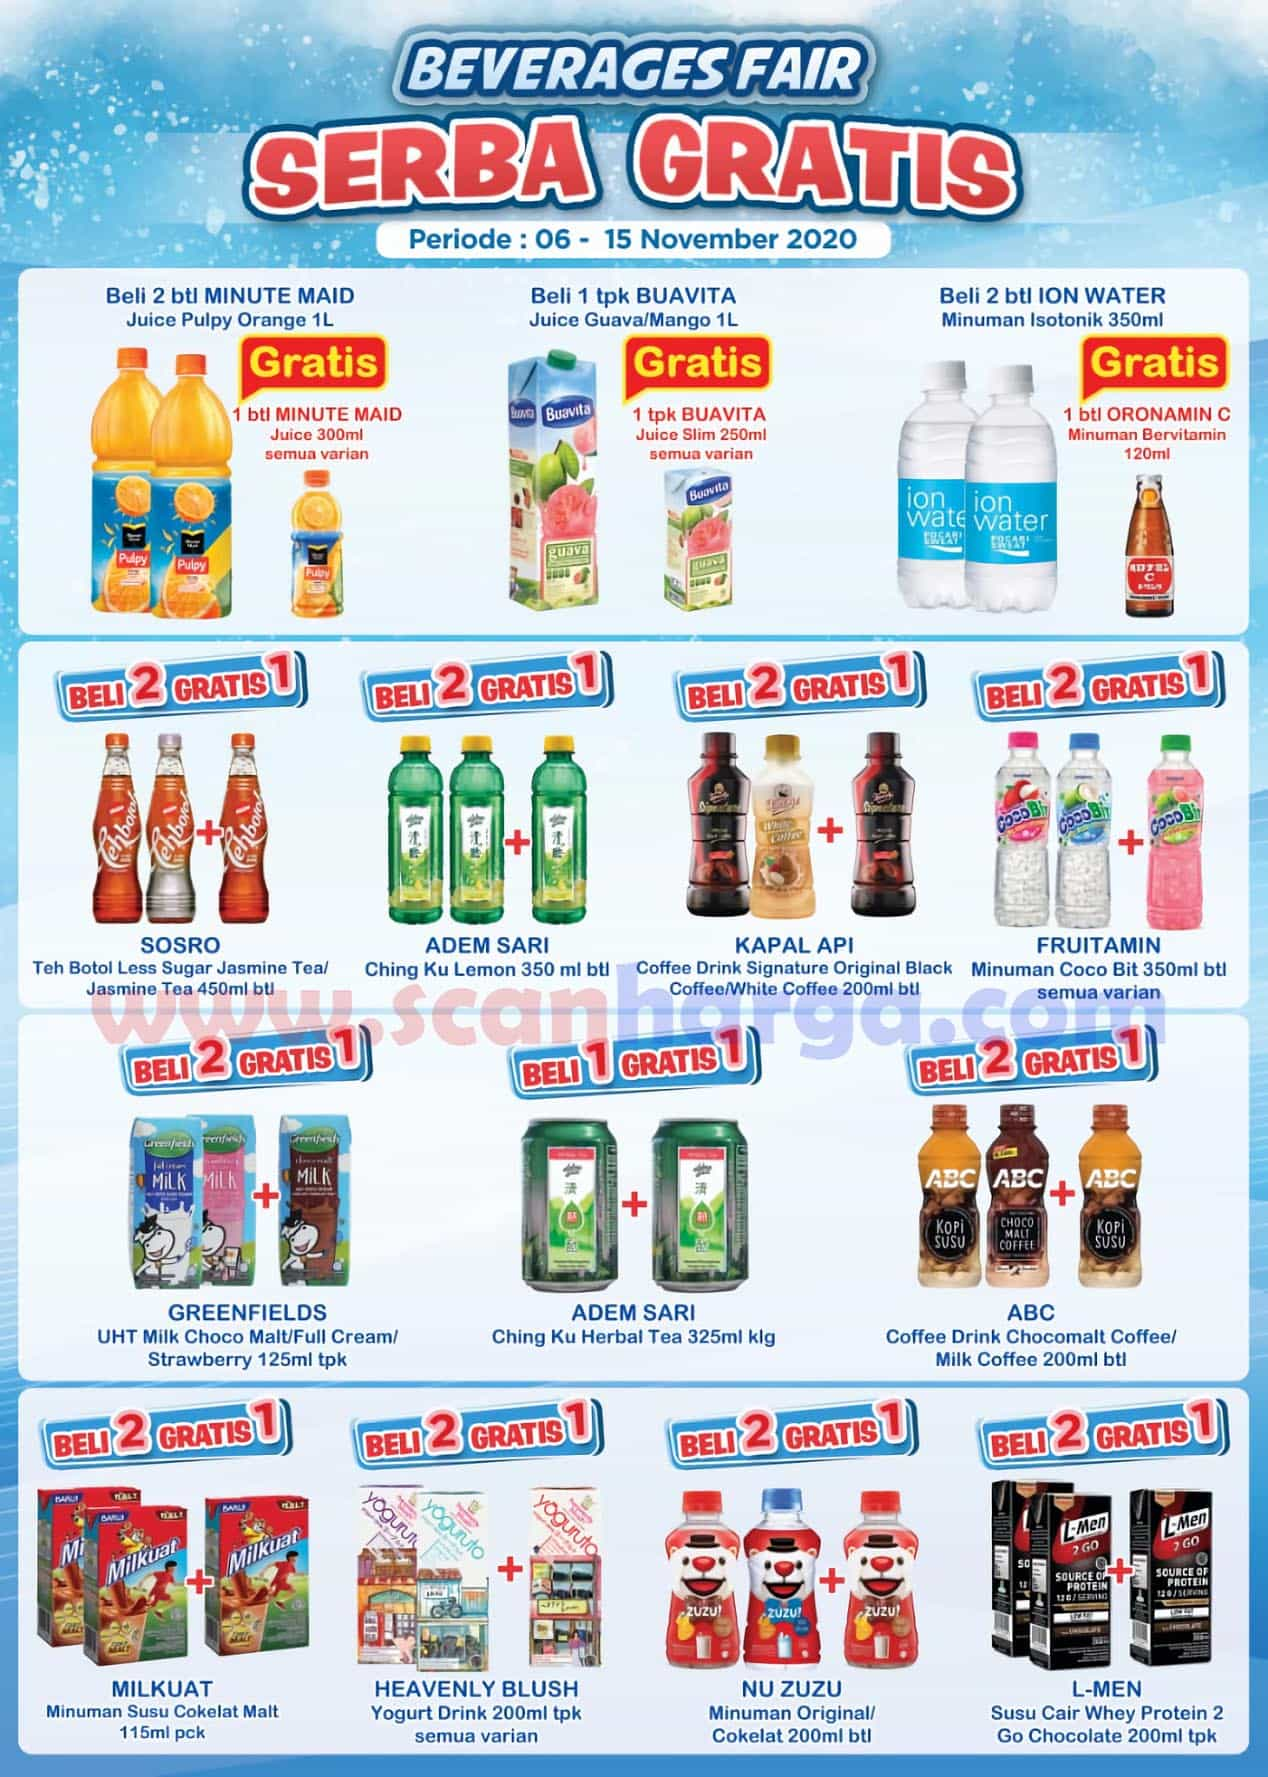 Indomaret Beverages Fair Promo Serba Gratis 06 - 15 November 2020